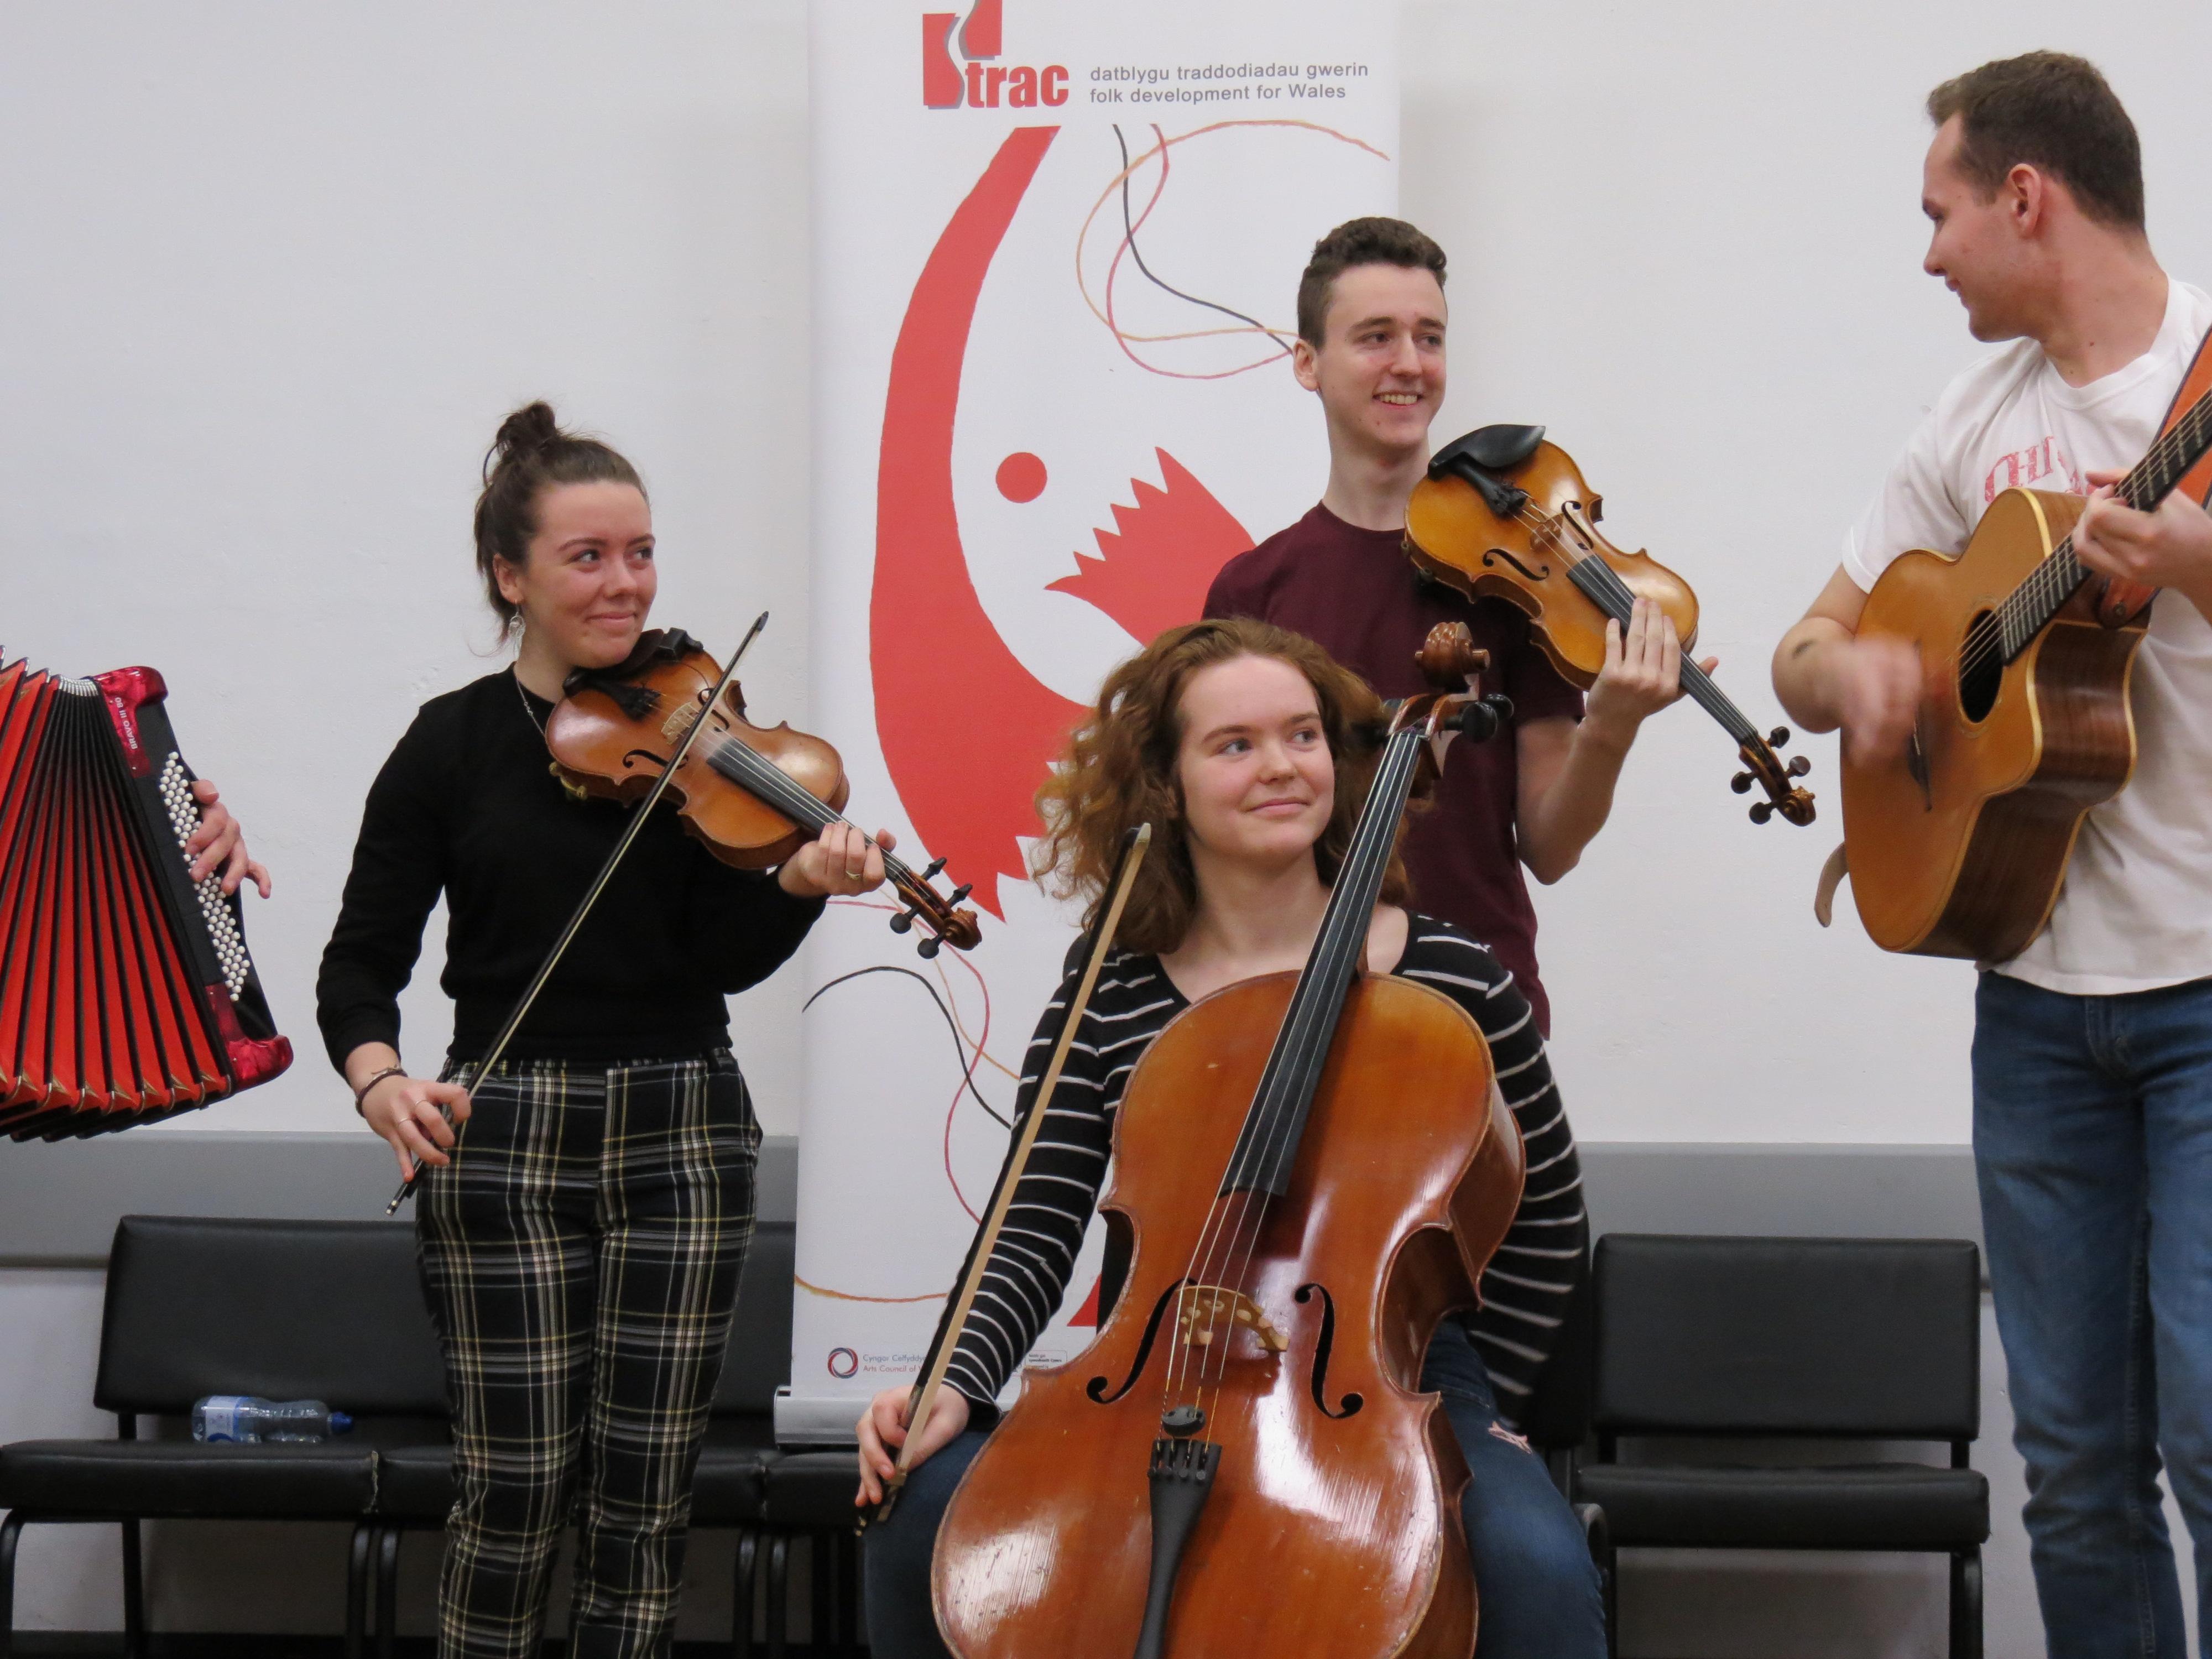 AVANC: The Youth Folk Ensemble of Wales